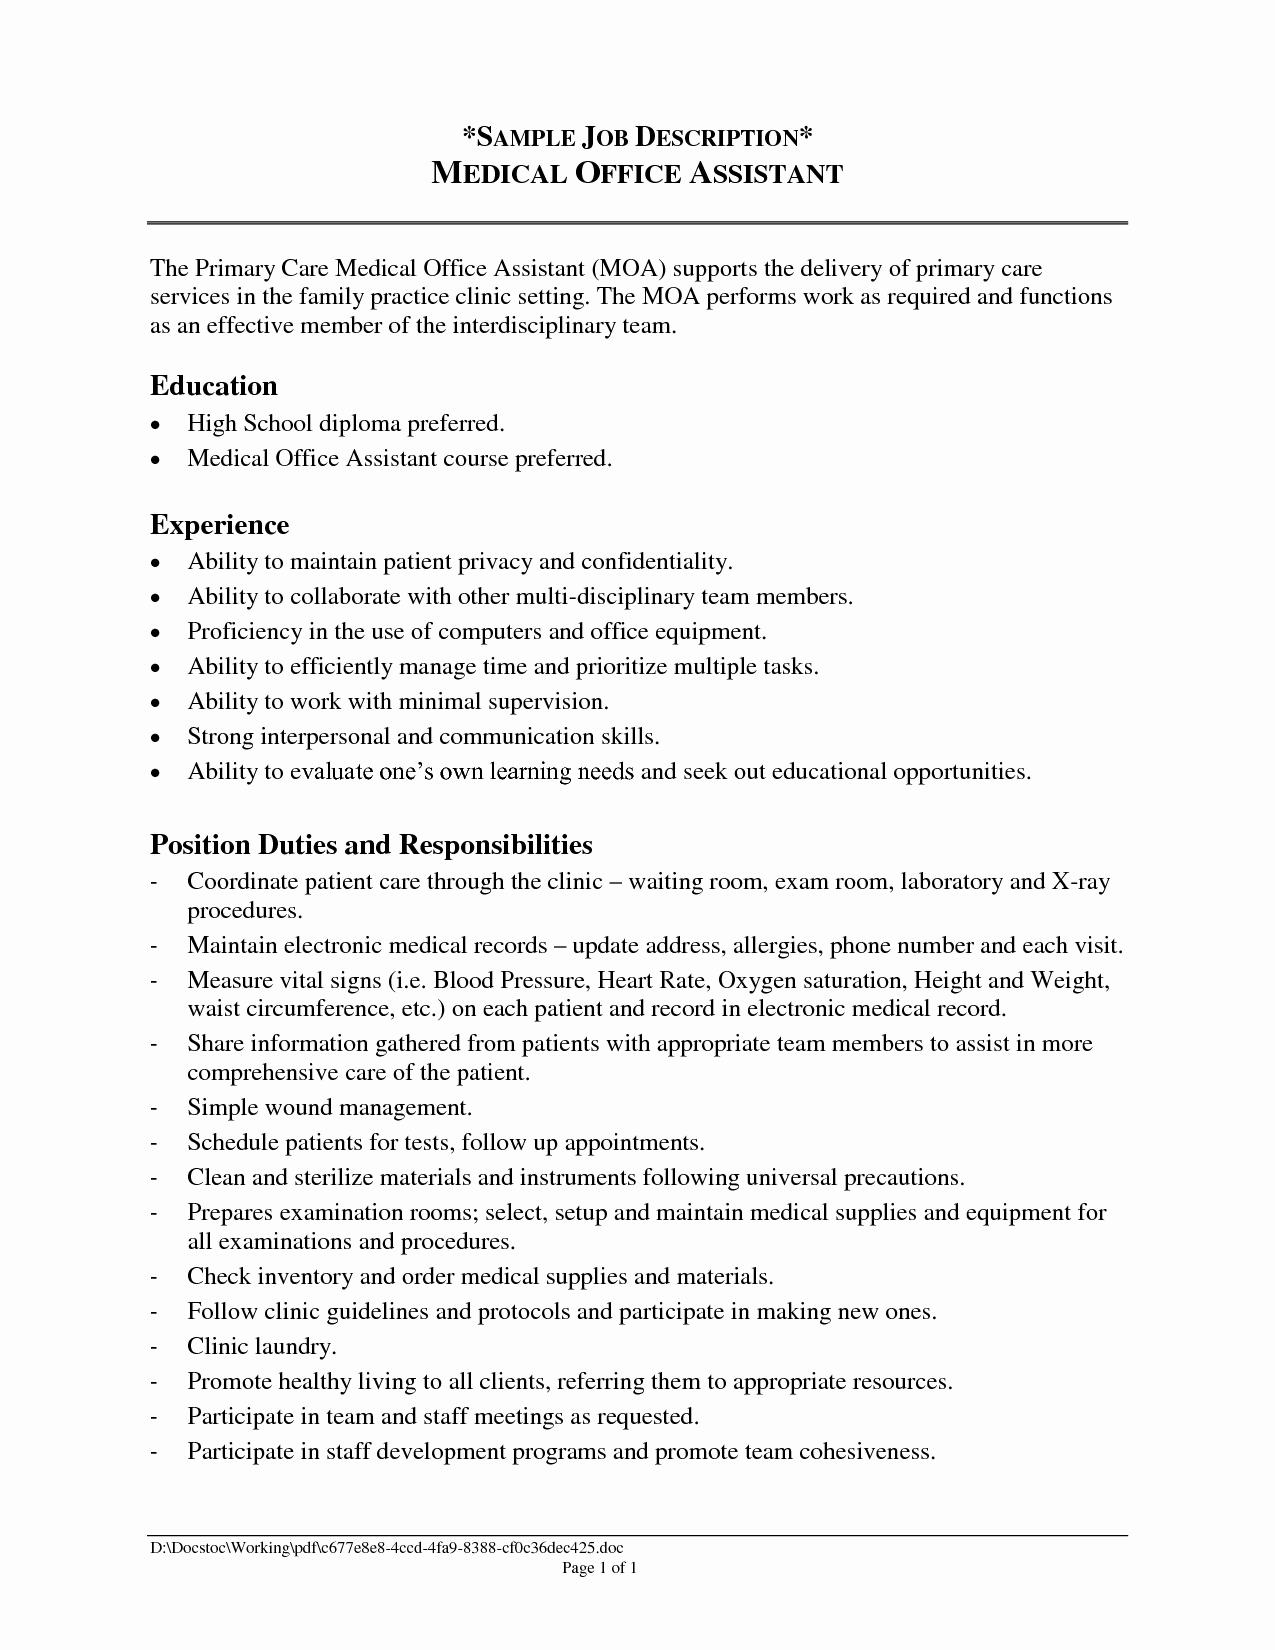 Fice assistant Job Description Resume 2016